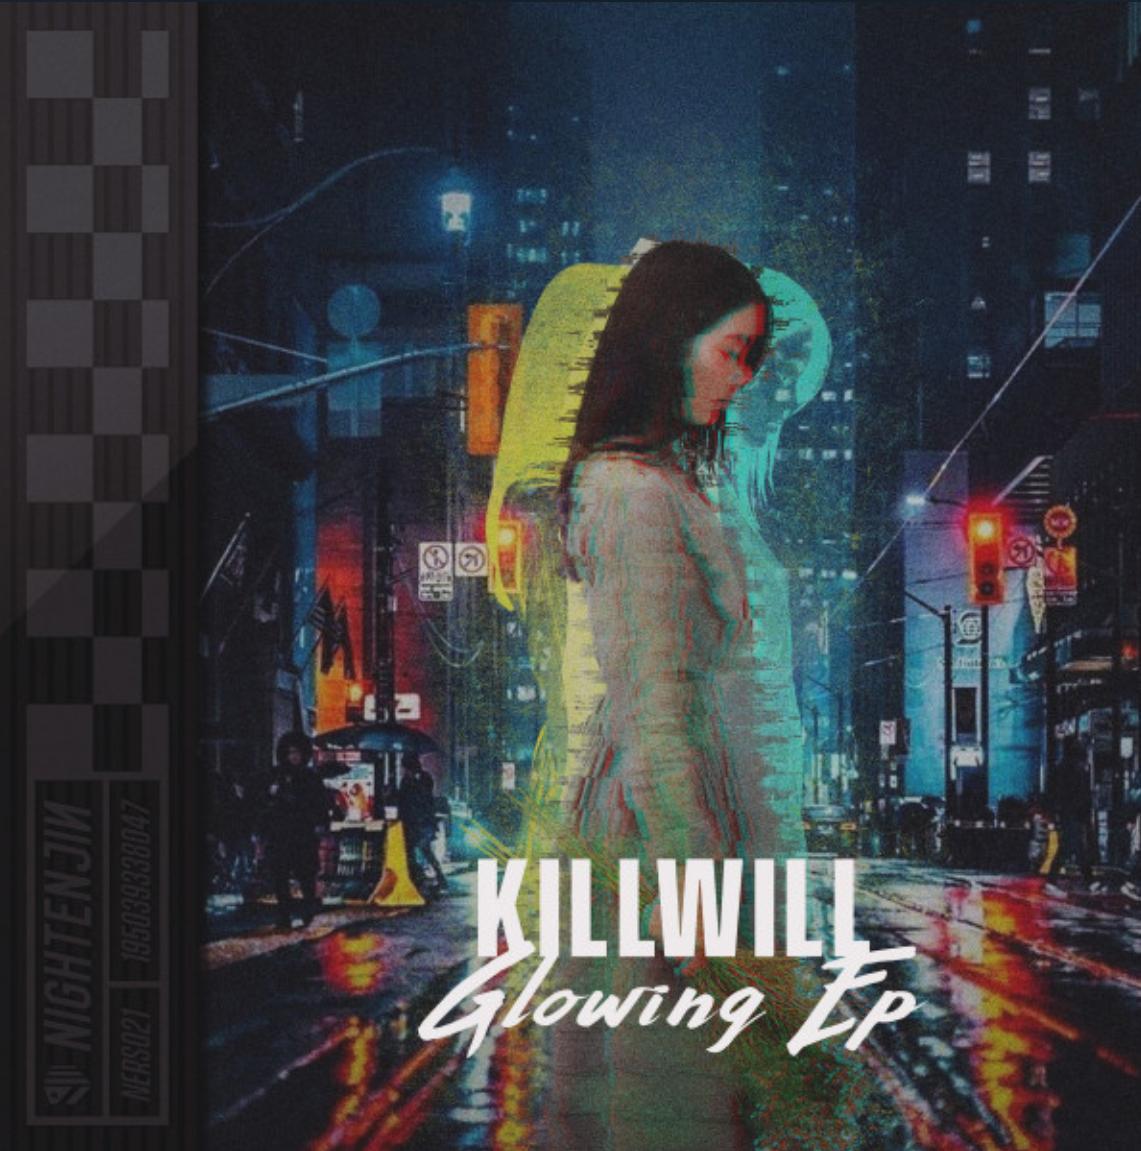 KillWill Glowing EP